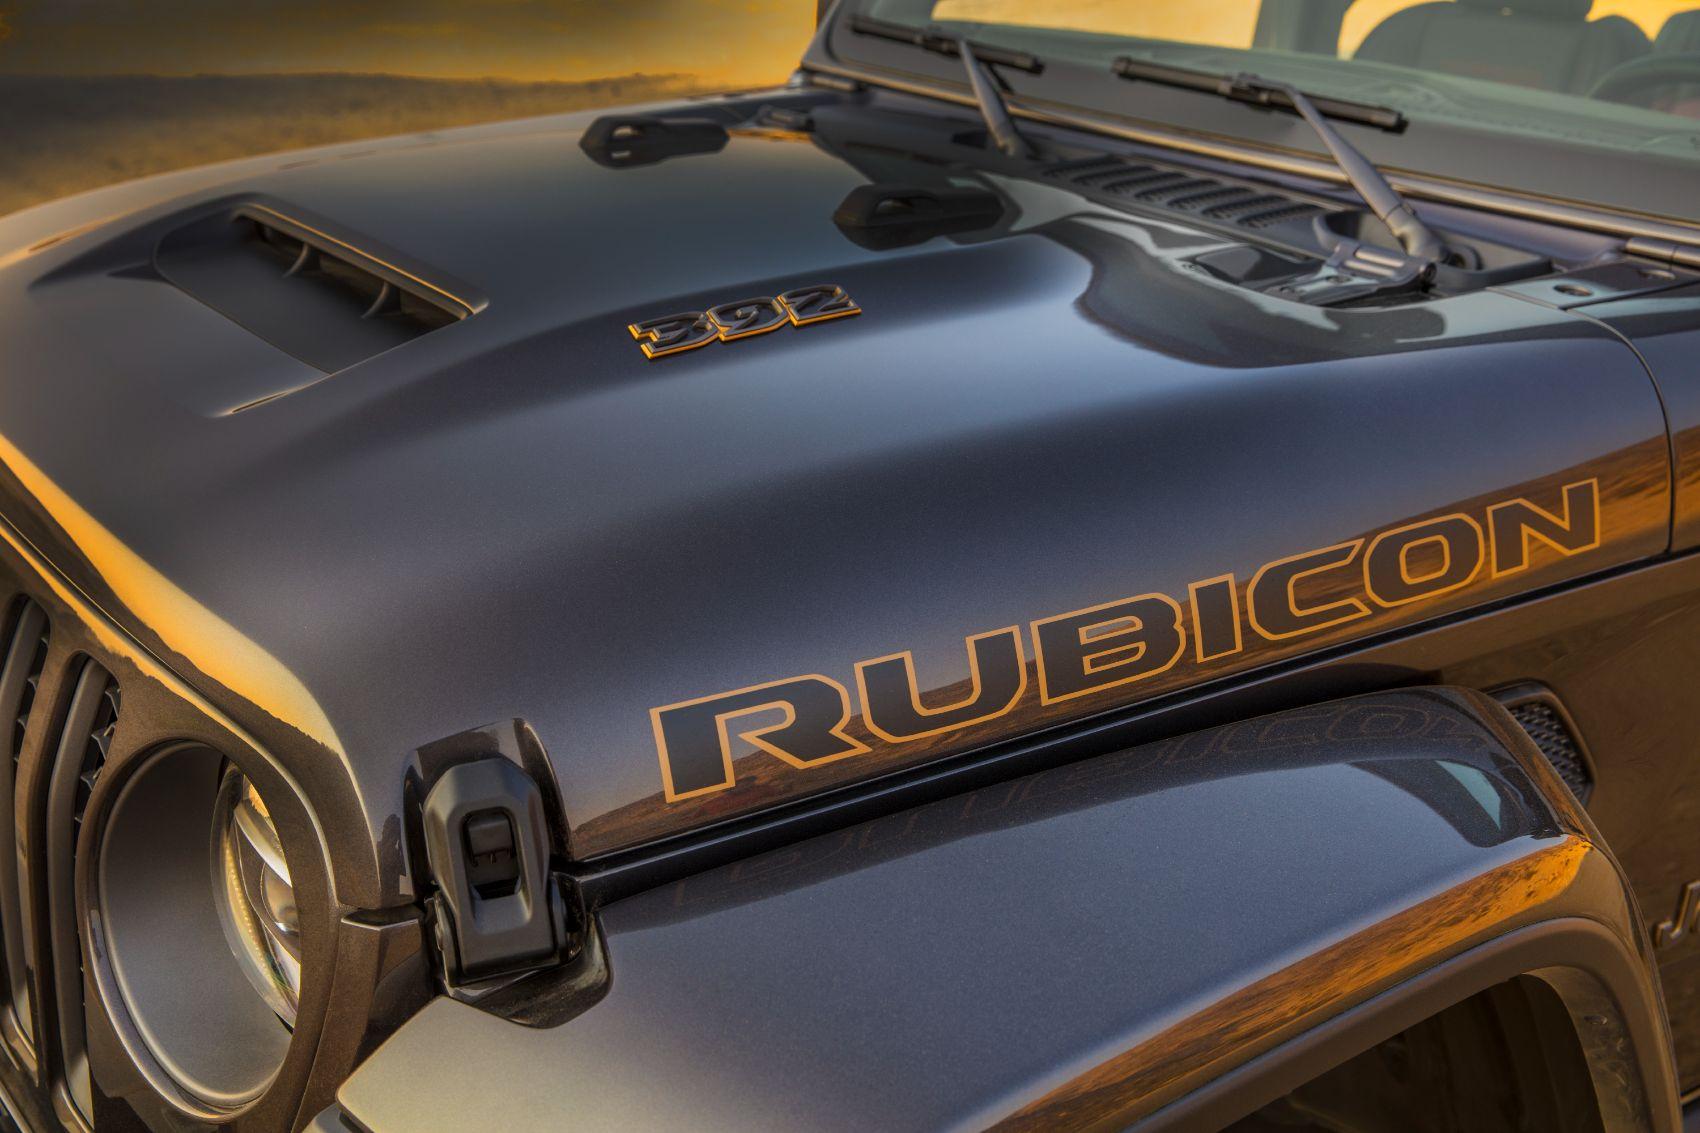 2021 Jeep Wrangler Rubicon 392 Big Hemi Wrangler Reports For Off Road Duty